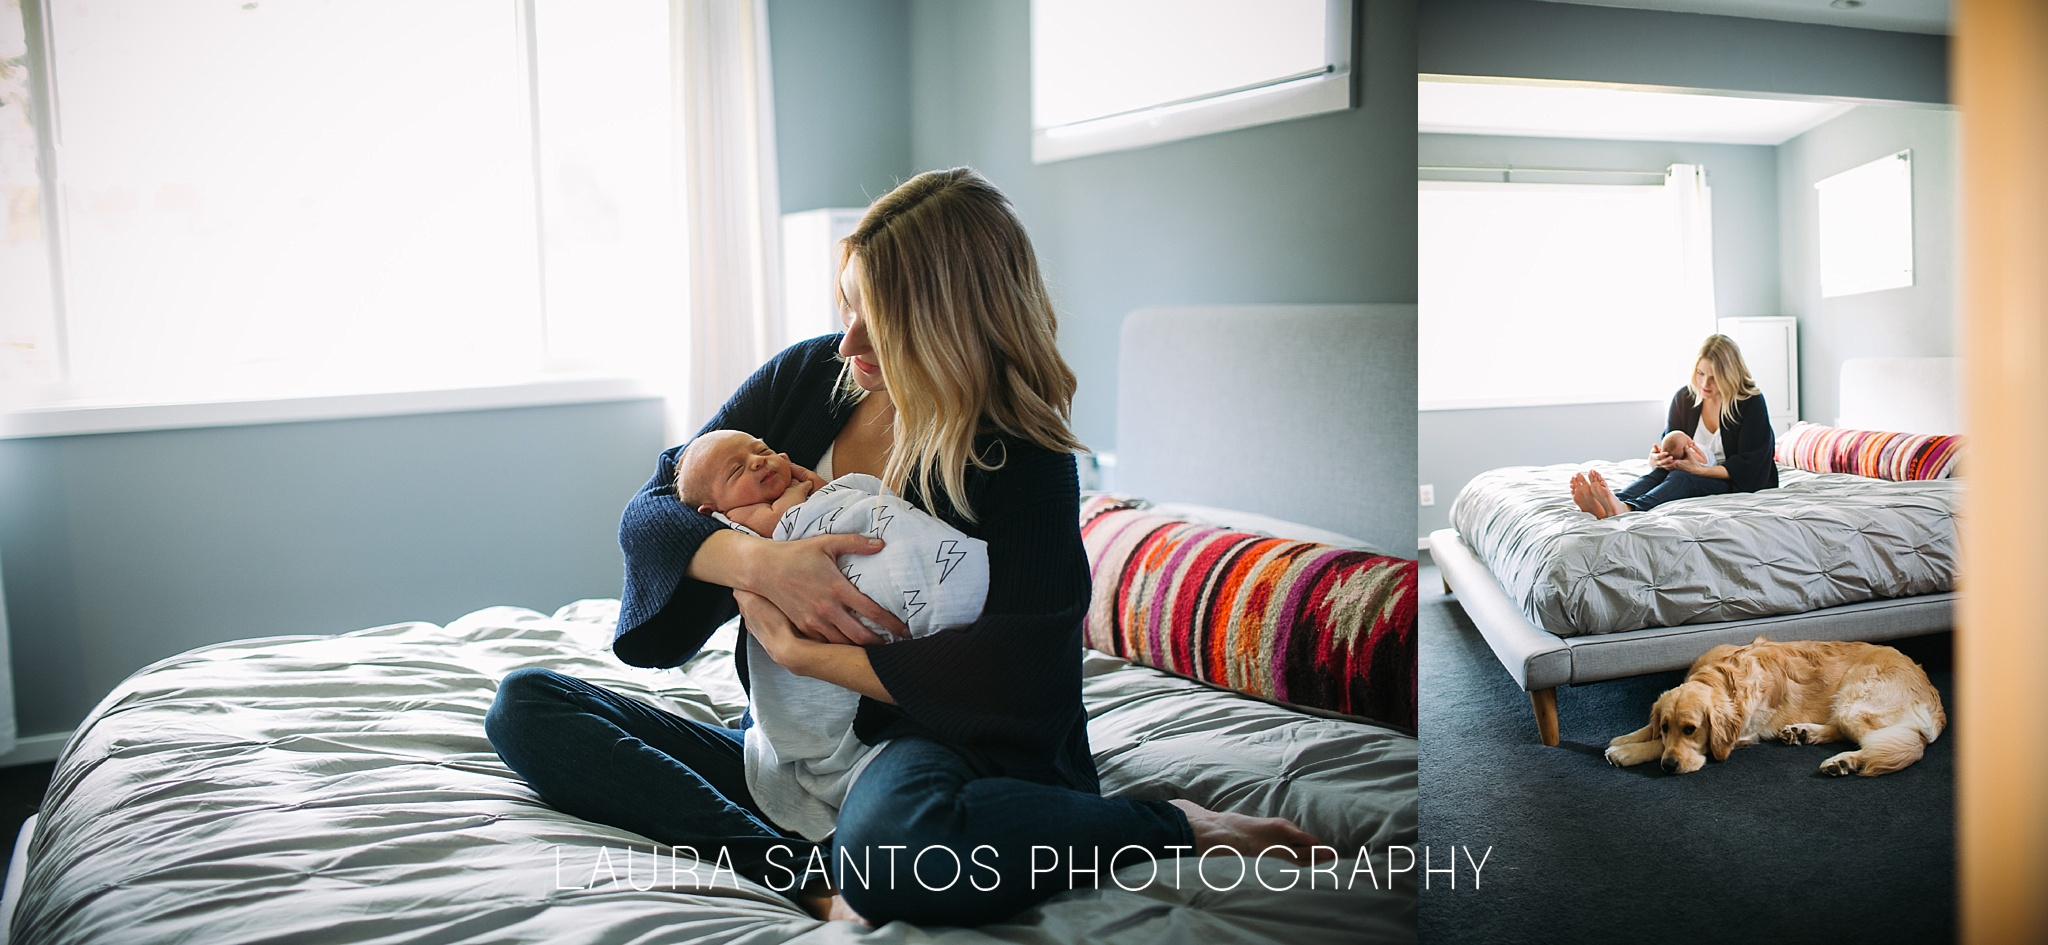 Laura Santos Photography Portland Oregon Family Photographer_0165.jpg